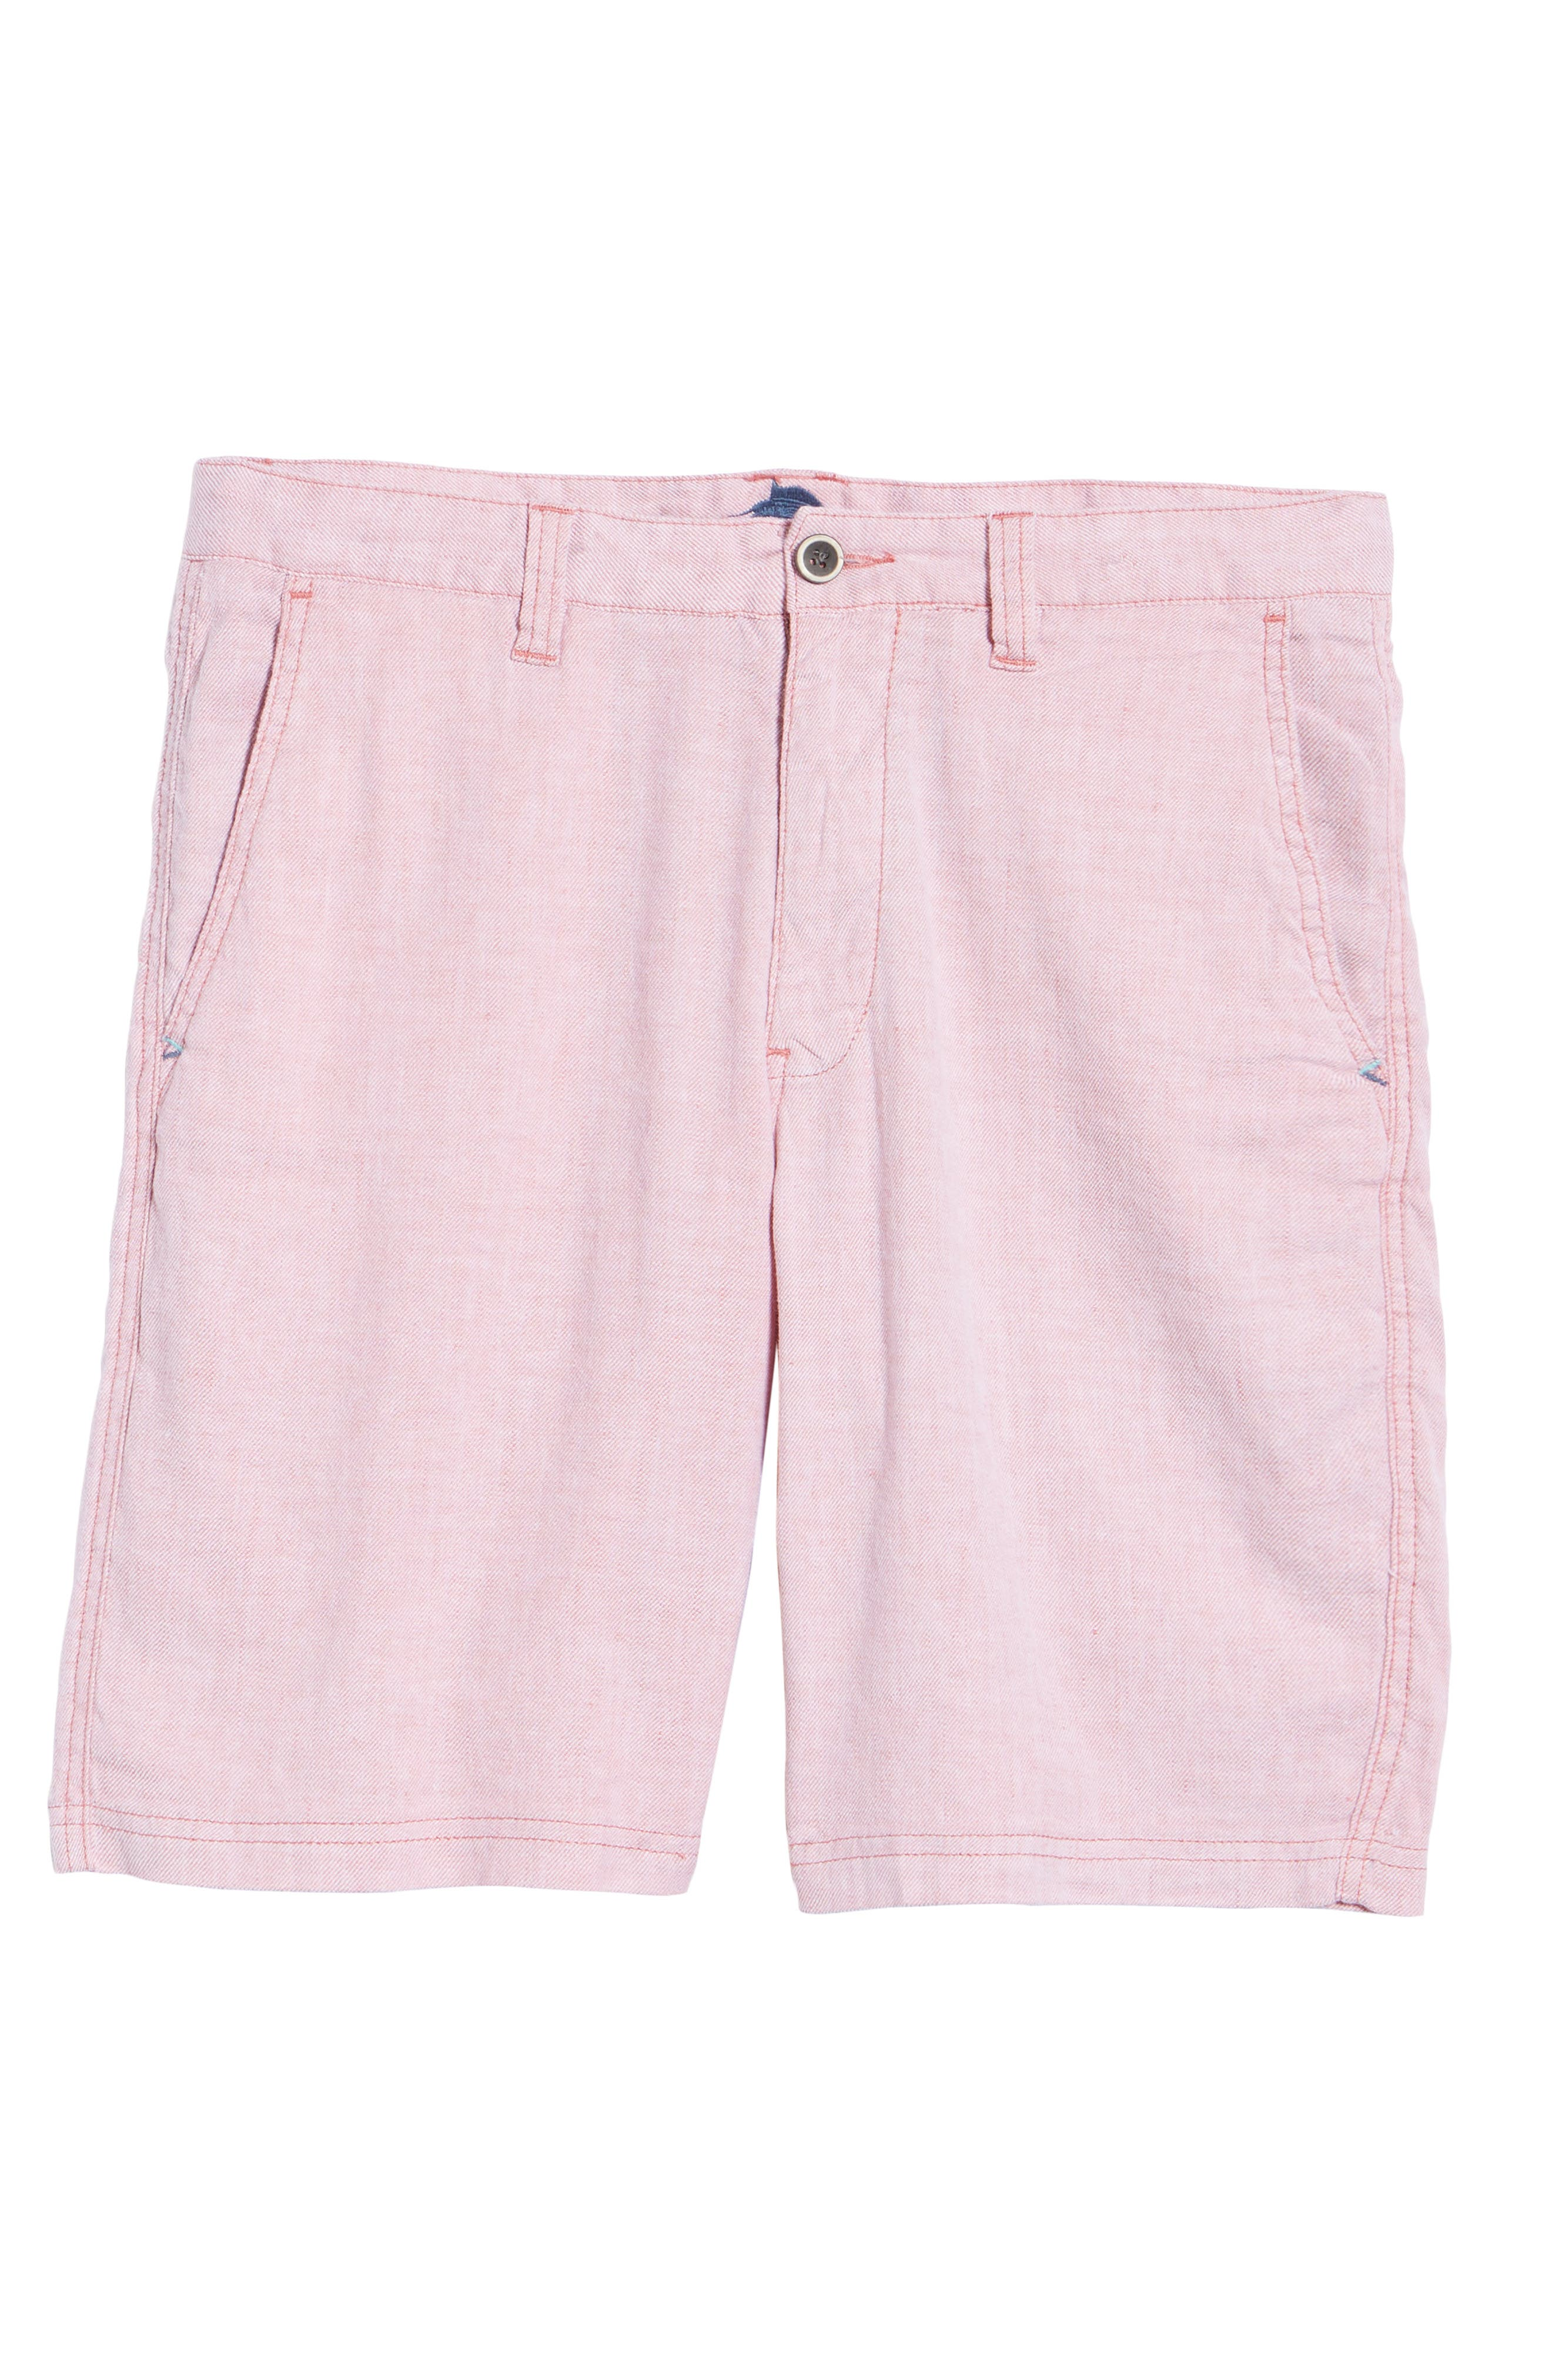 Beach Linen Blend Shorts,                             Alternate thumbnail 6, color,                             Red Sunset